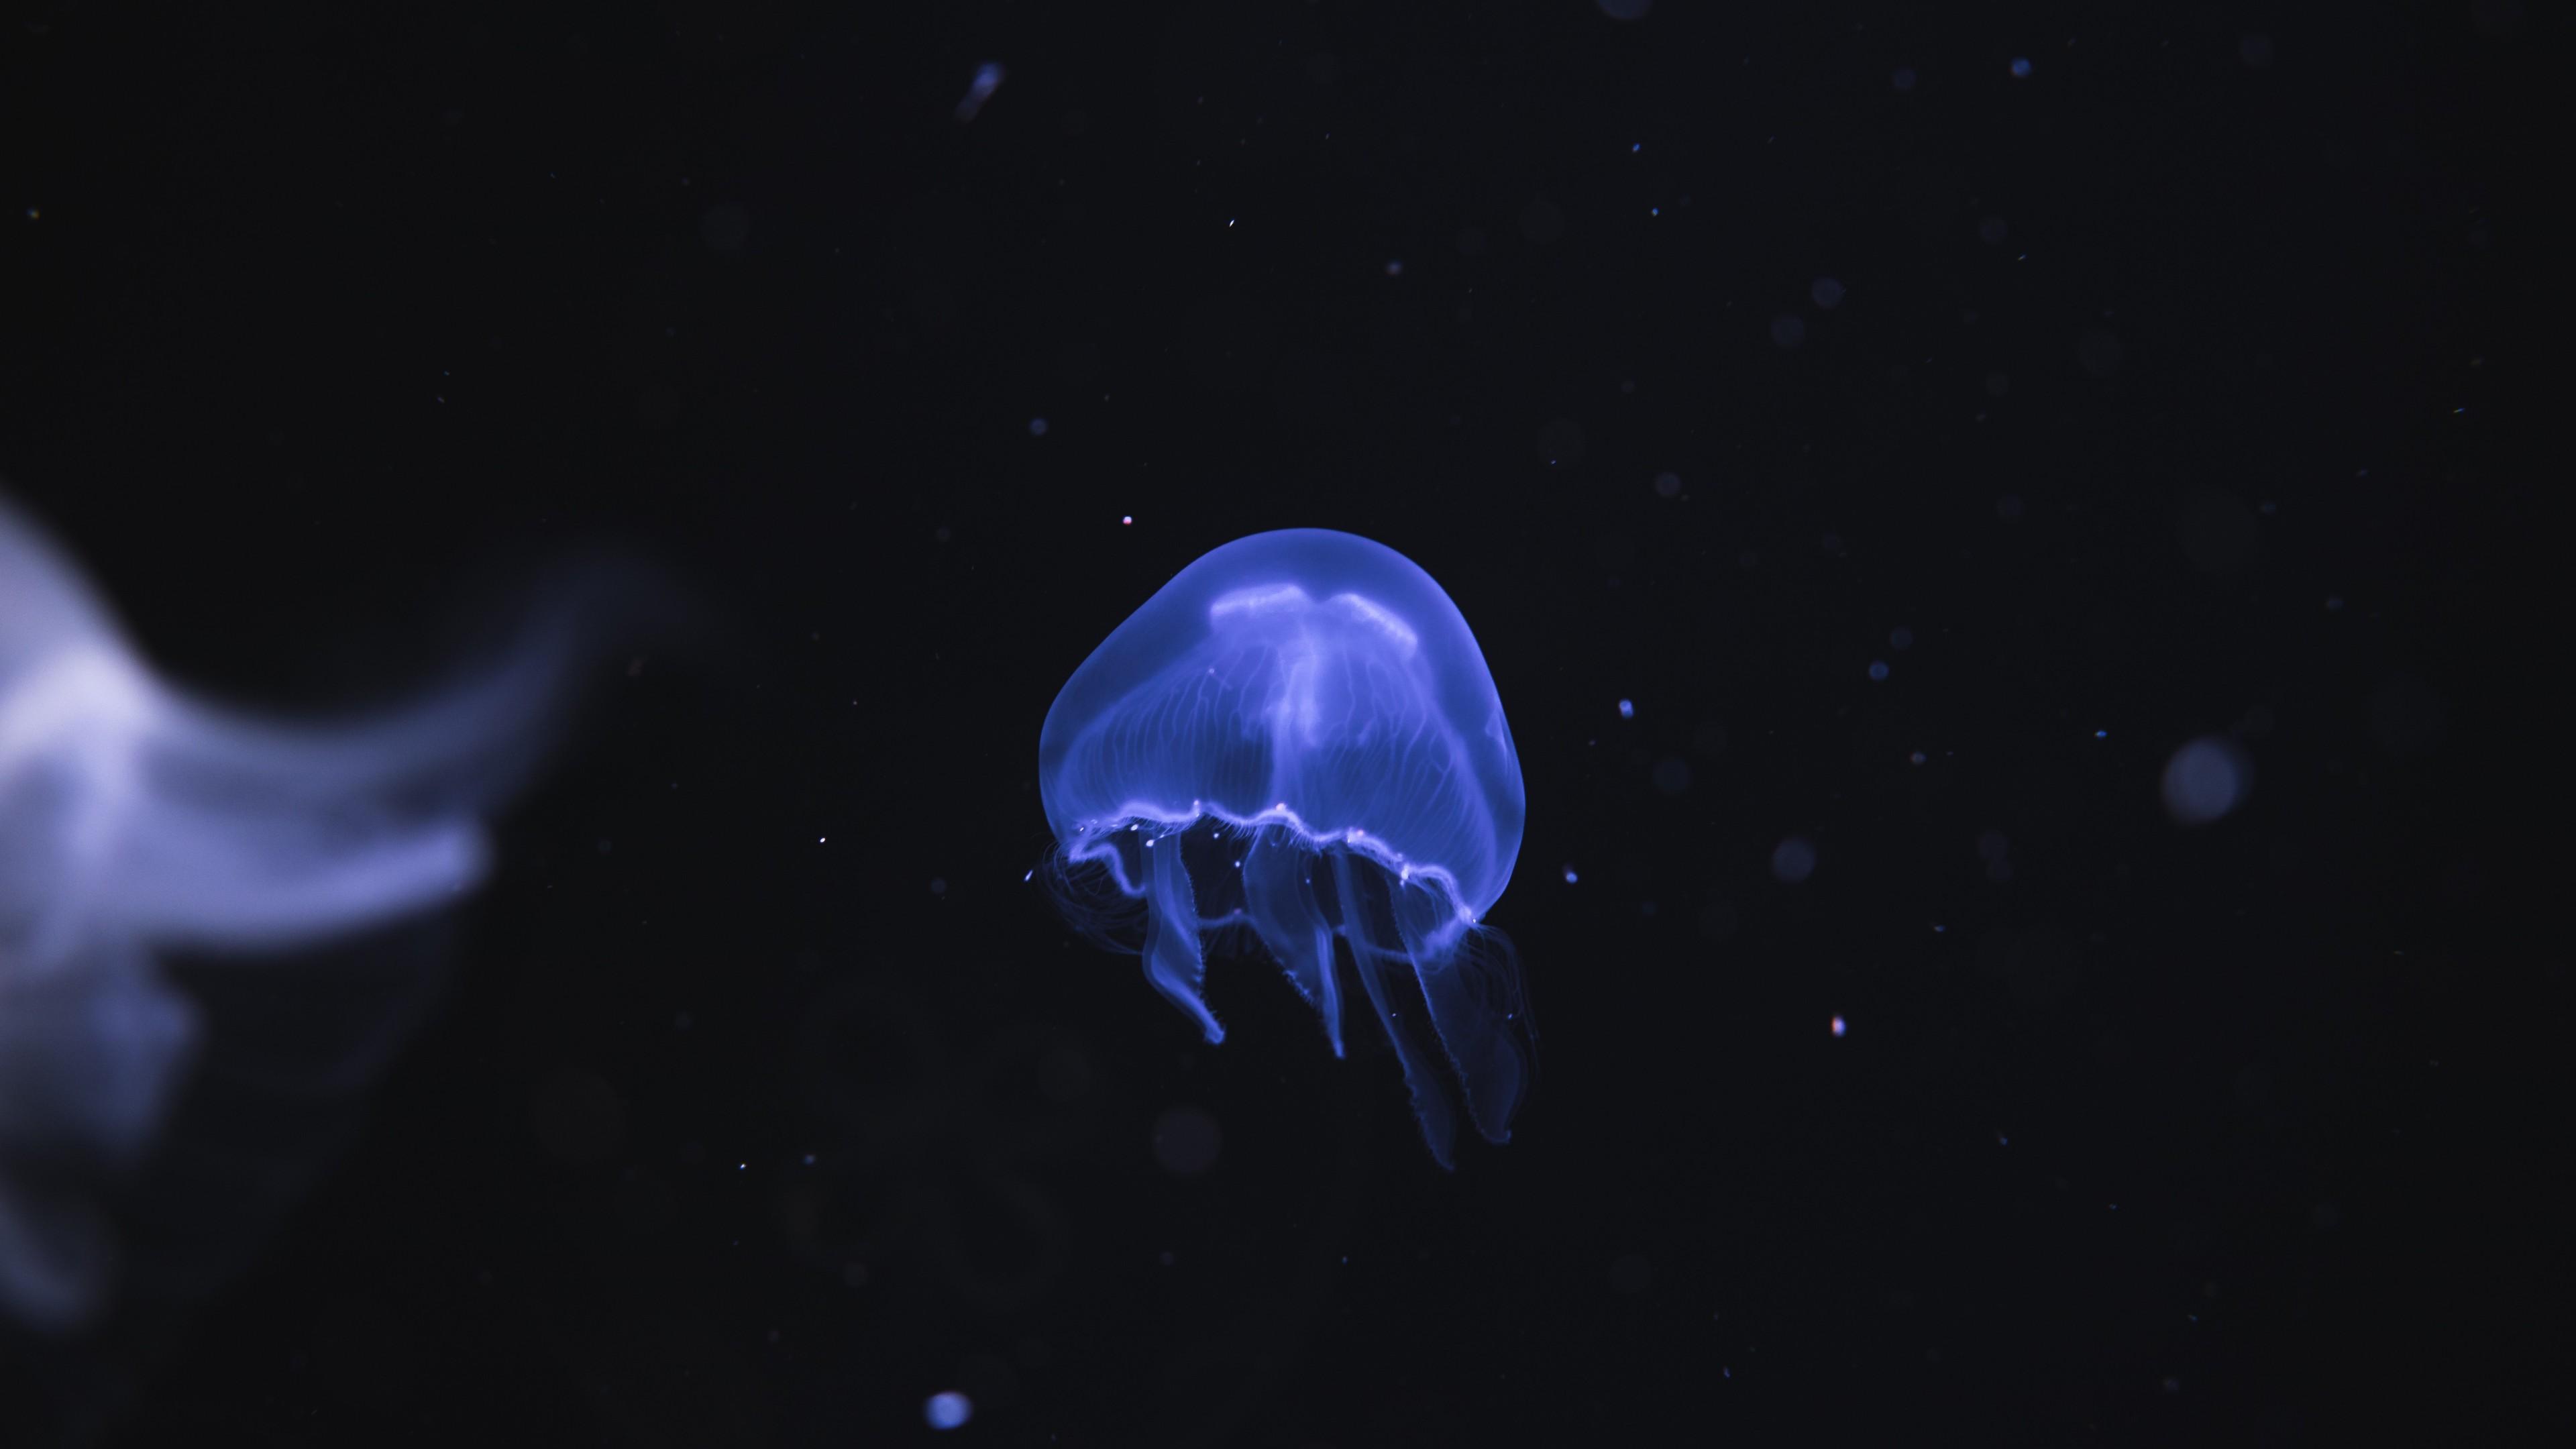 jellyfish underwater 4k 1542239114 - Jellyfish Underwater 4k - underwater wallpapers, jellyfish wallpapers, hd-wallpapers, animals wallpapers, 4k-wallpapers